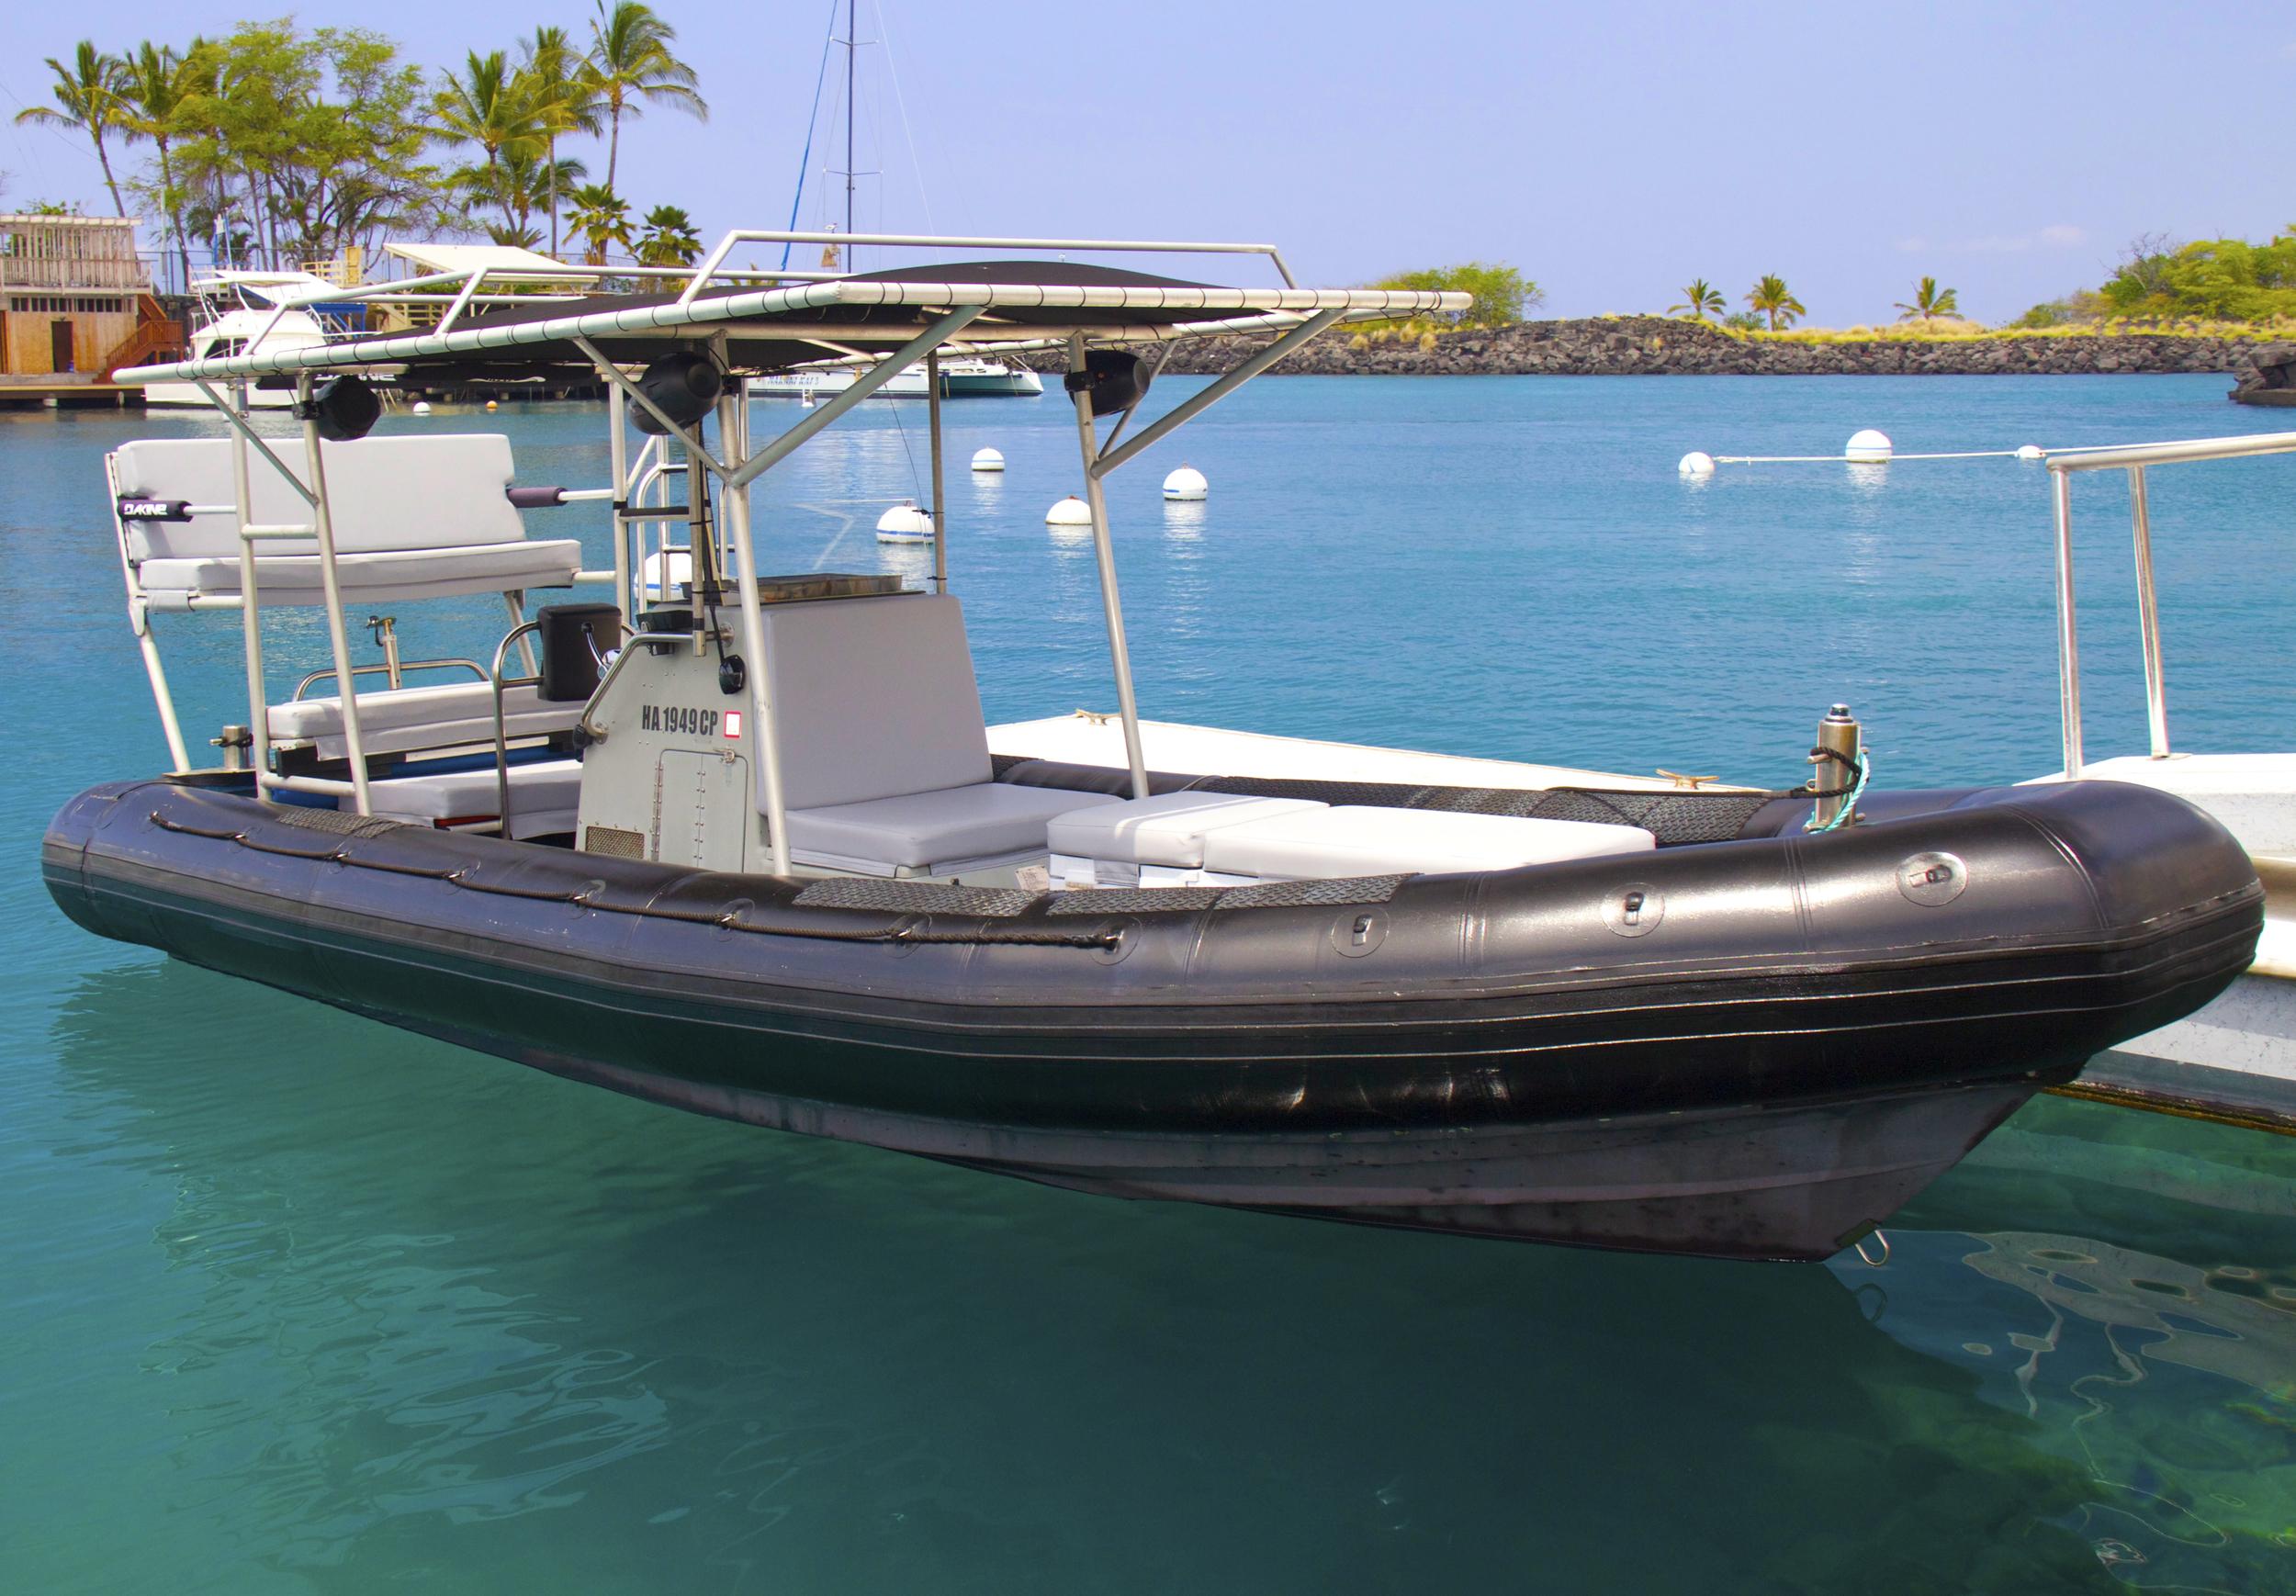 Our Boat LiquidHi custom Northport SeaForce 730 Military Zodiac